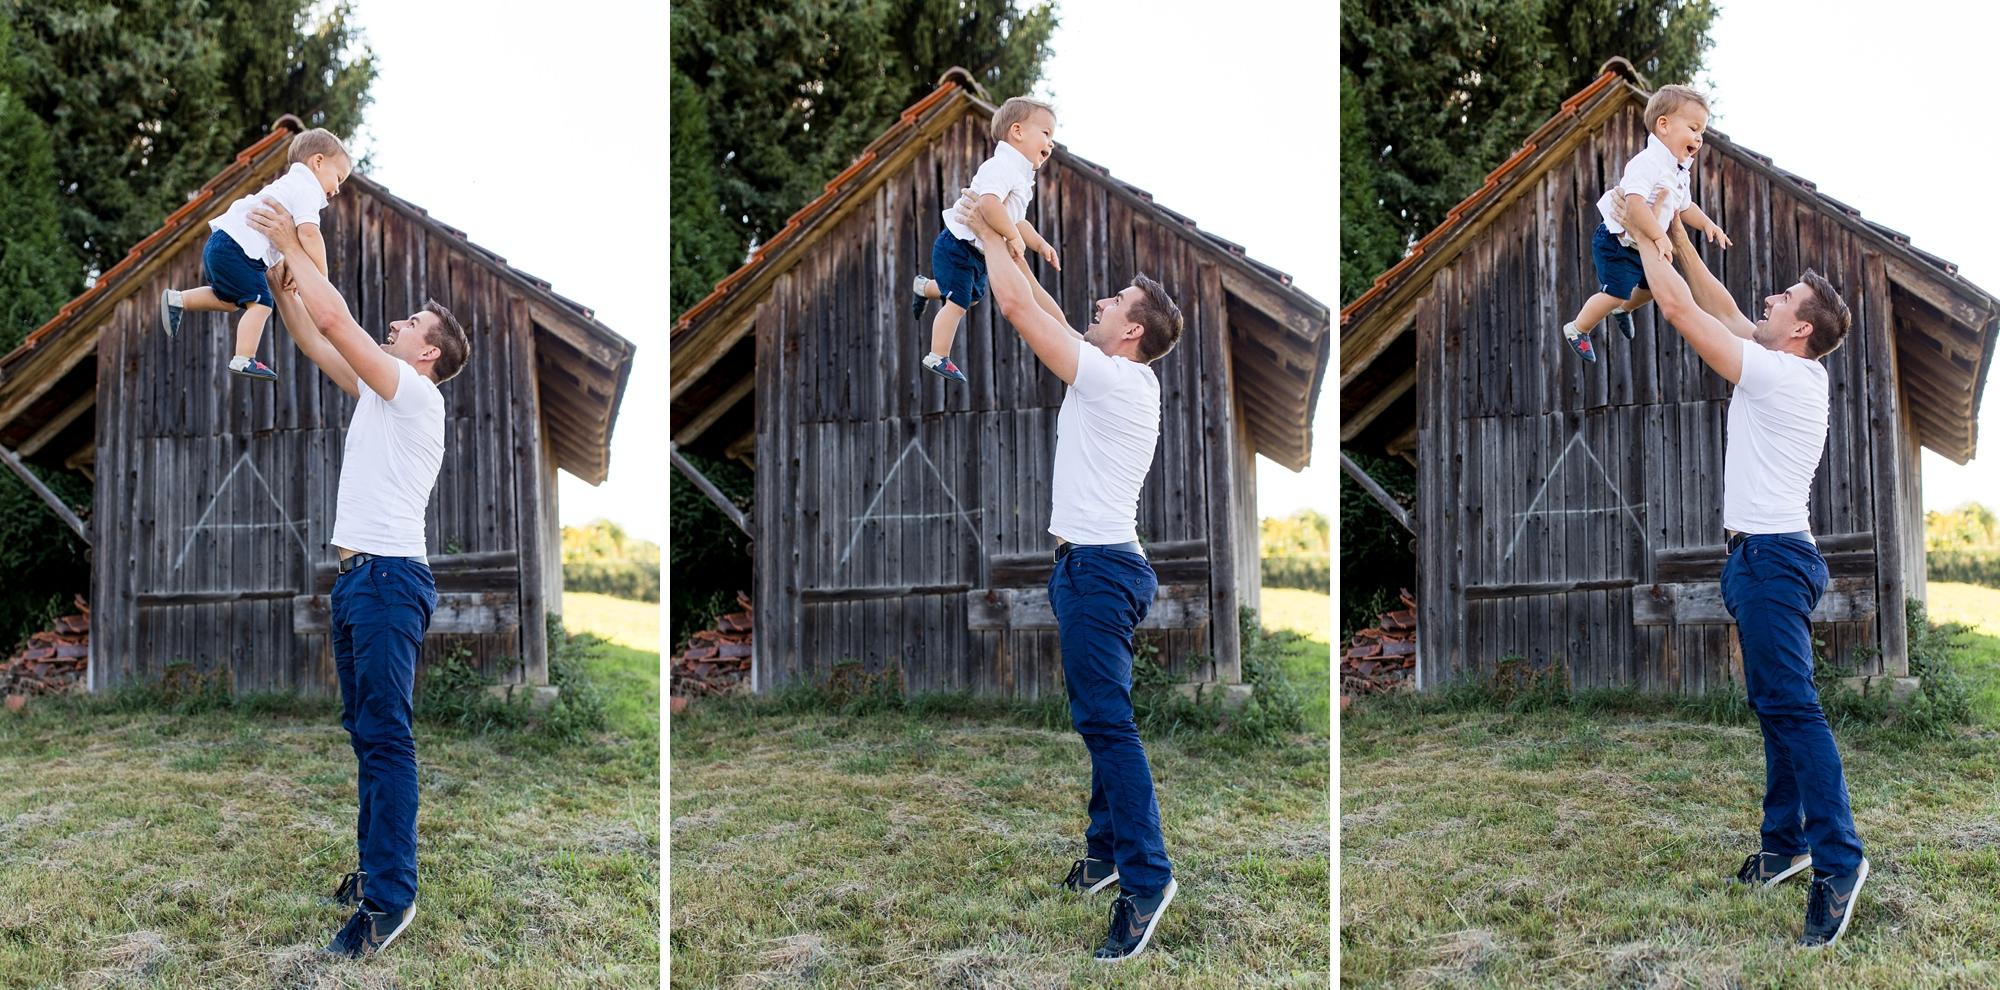 Papa lässt seinen kleinen Sohn hoch fliegen.